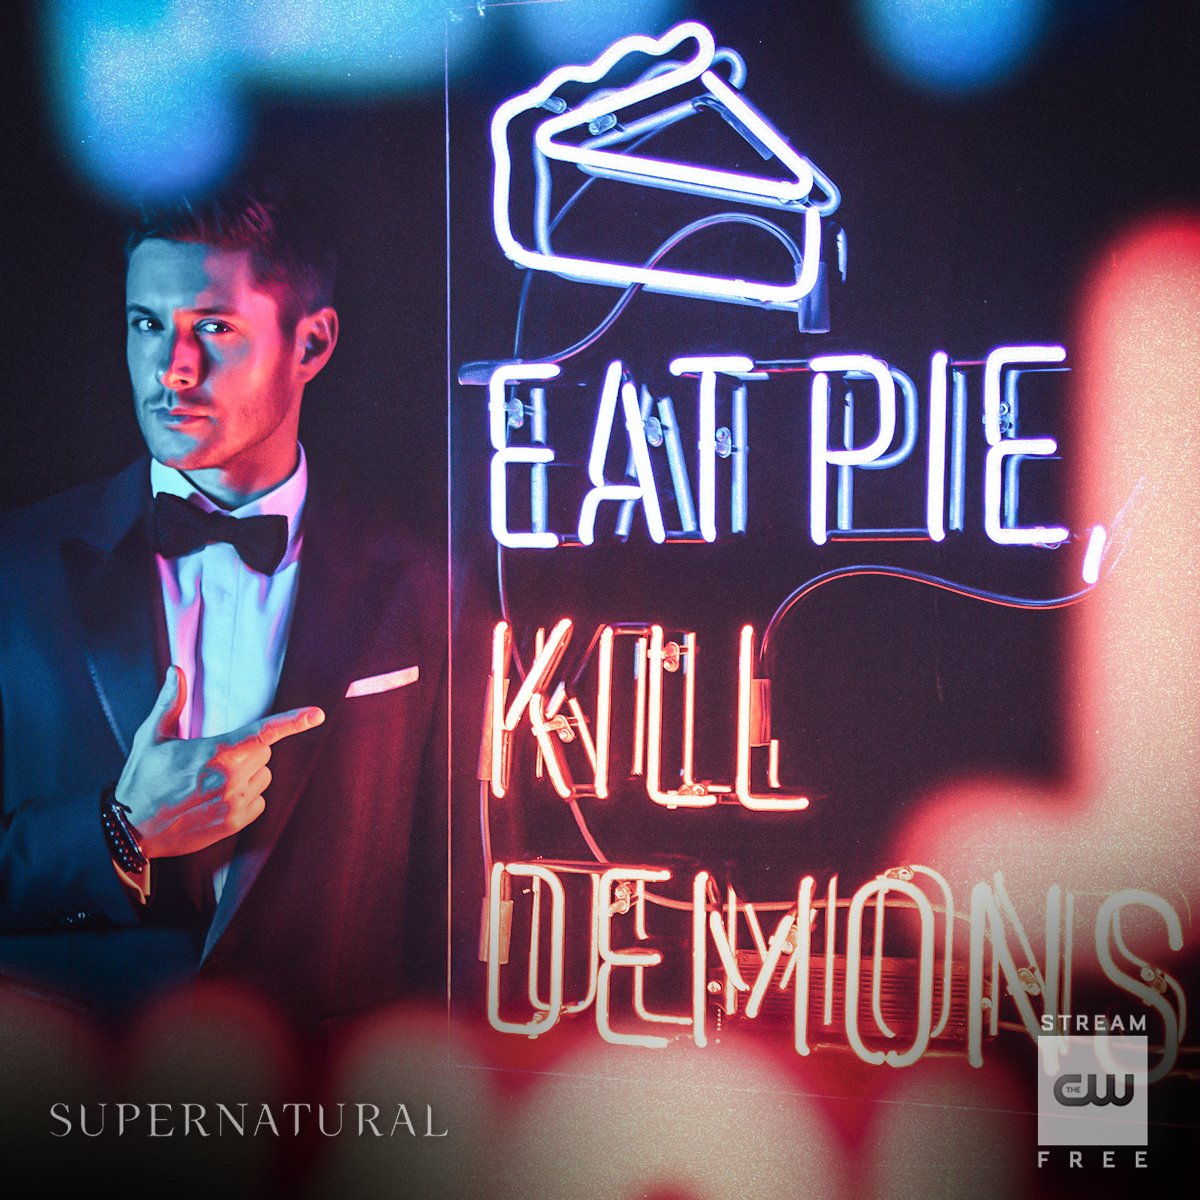 Eat pie. Kill demons. Stream the 300th episode: https://t.co/ZCIZSAIXTe #Supernatural #SPN300 https://t.co/RtAd3gt5H0